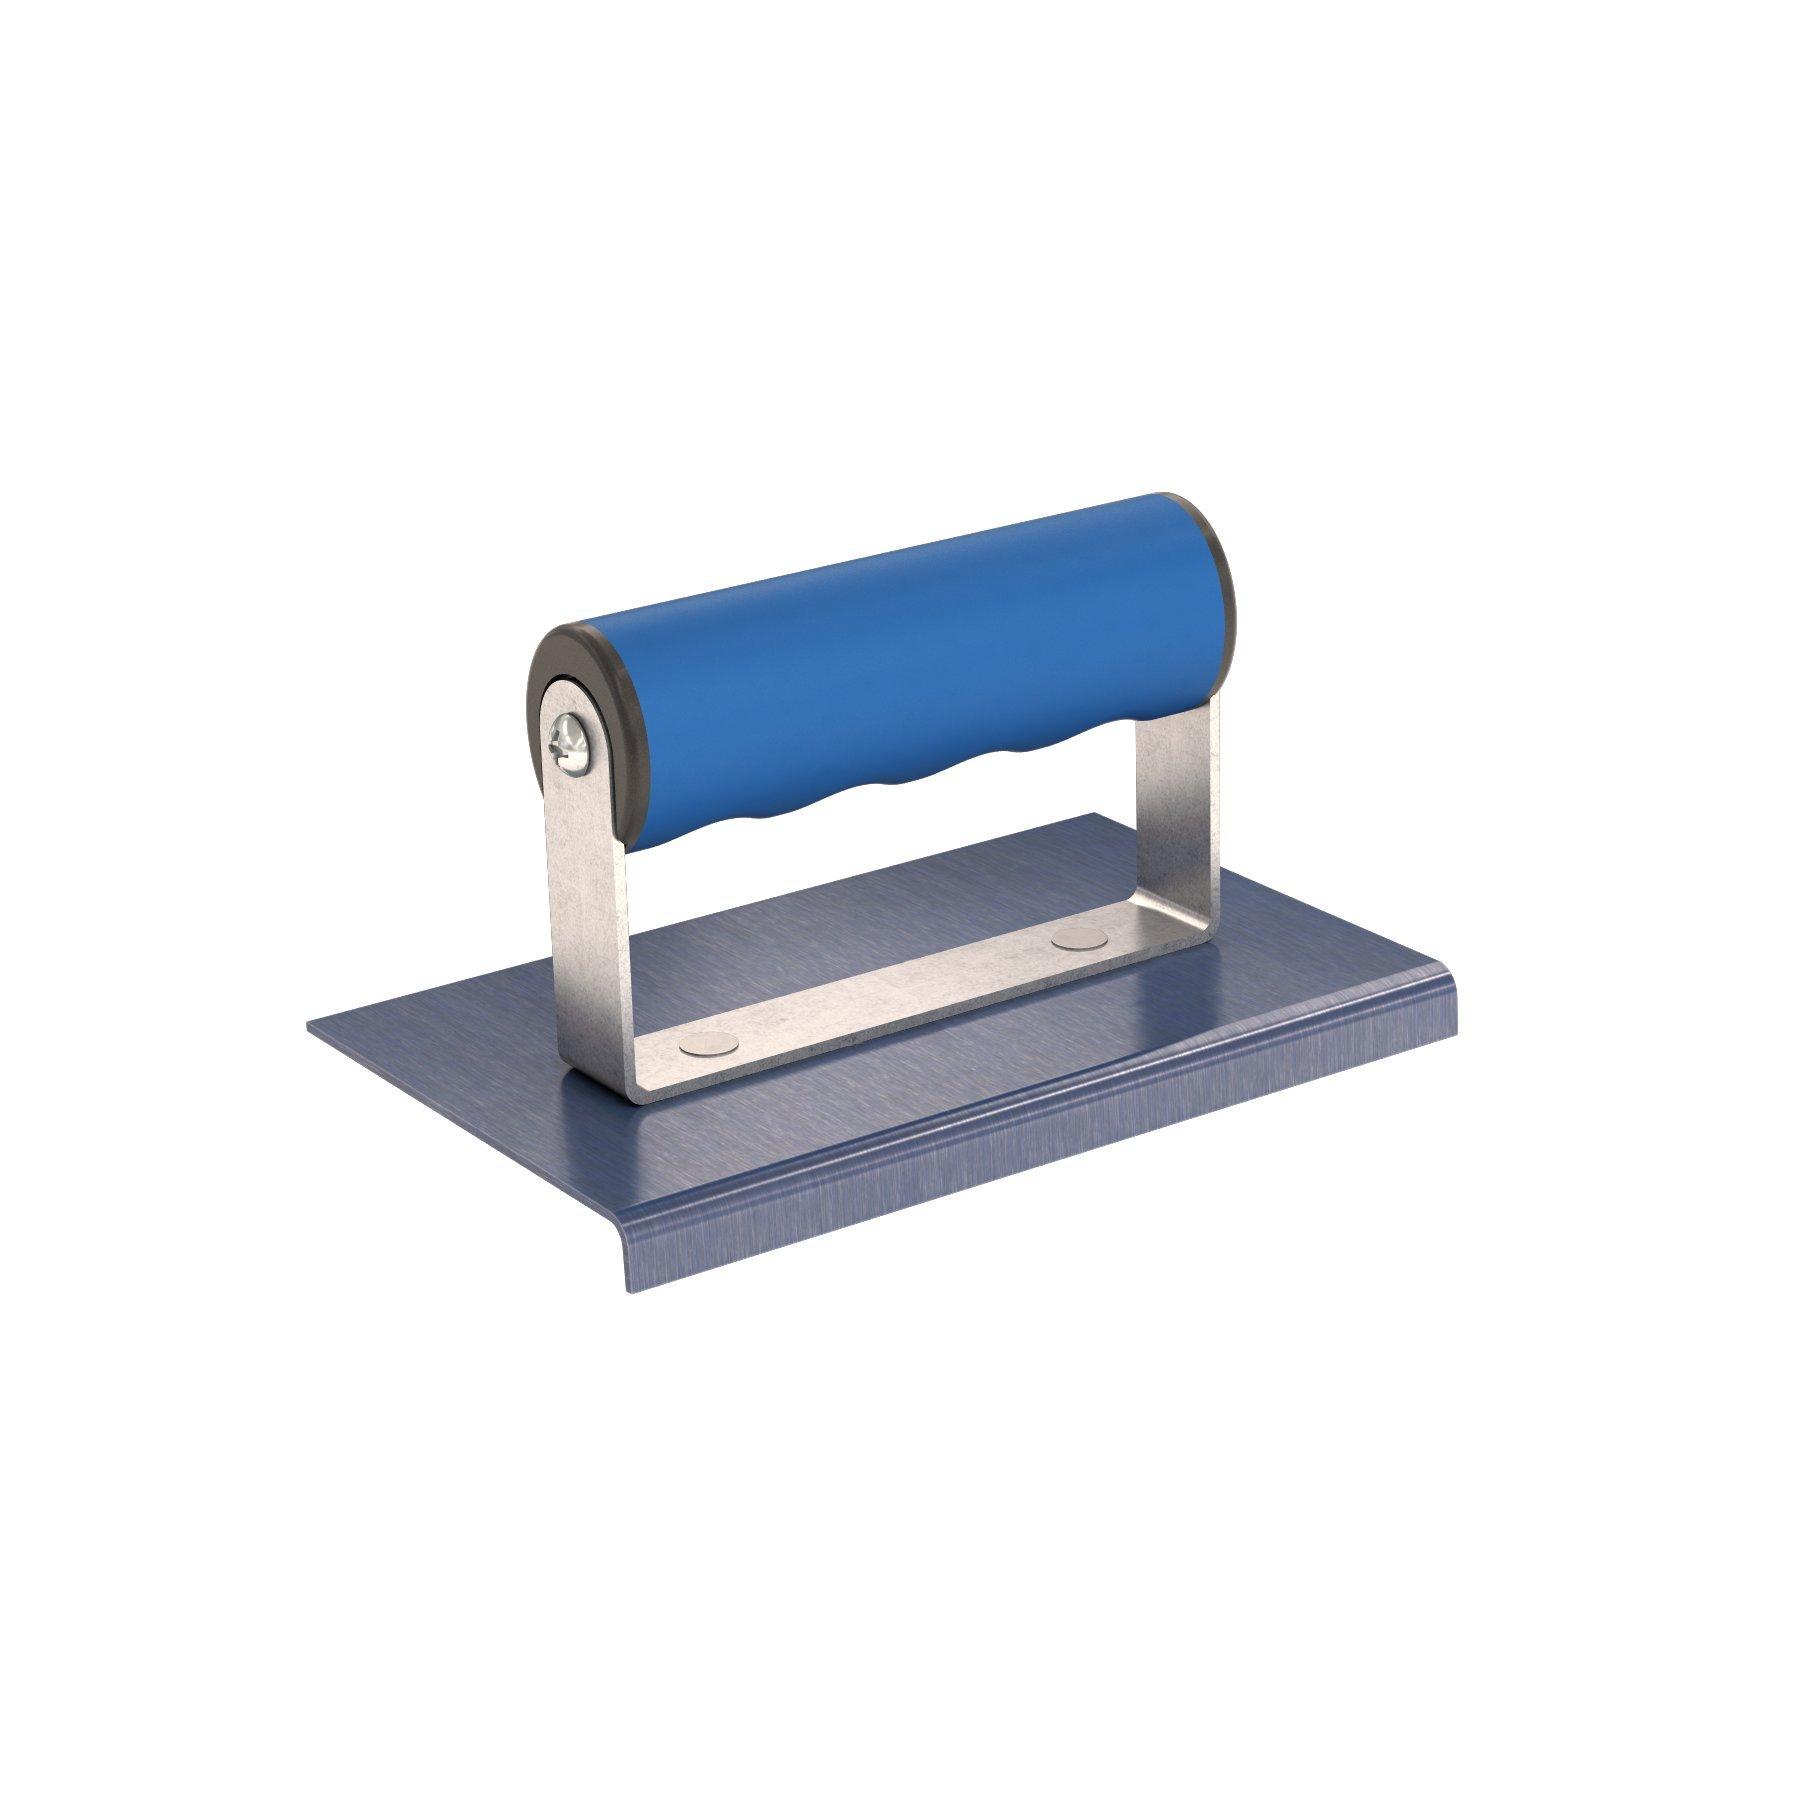 Bon 22-717 6-Inch by 4-Inch Blue Steel Sidewalk Edger, 1/8-Inch Radius 3/8-Inch Lip and Comfort Grip Handle